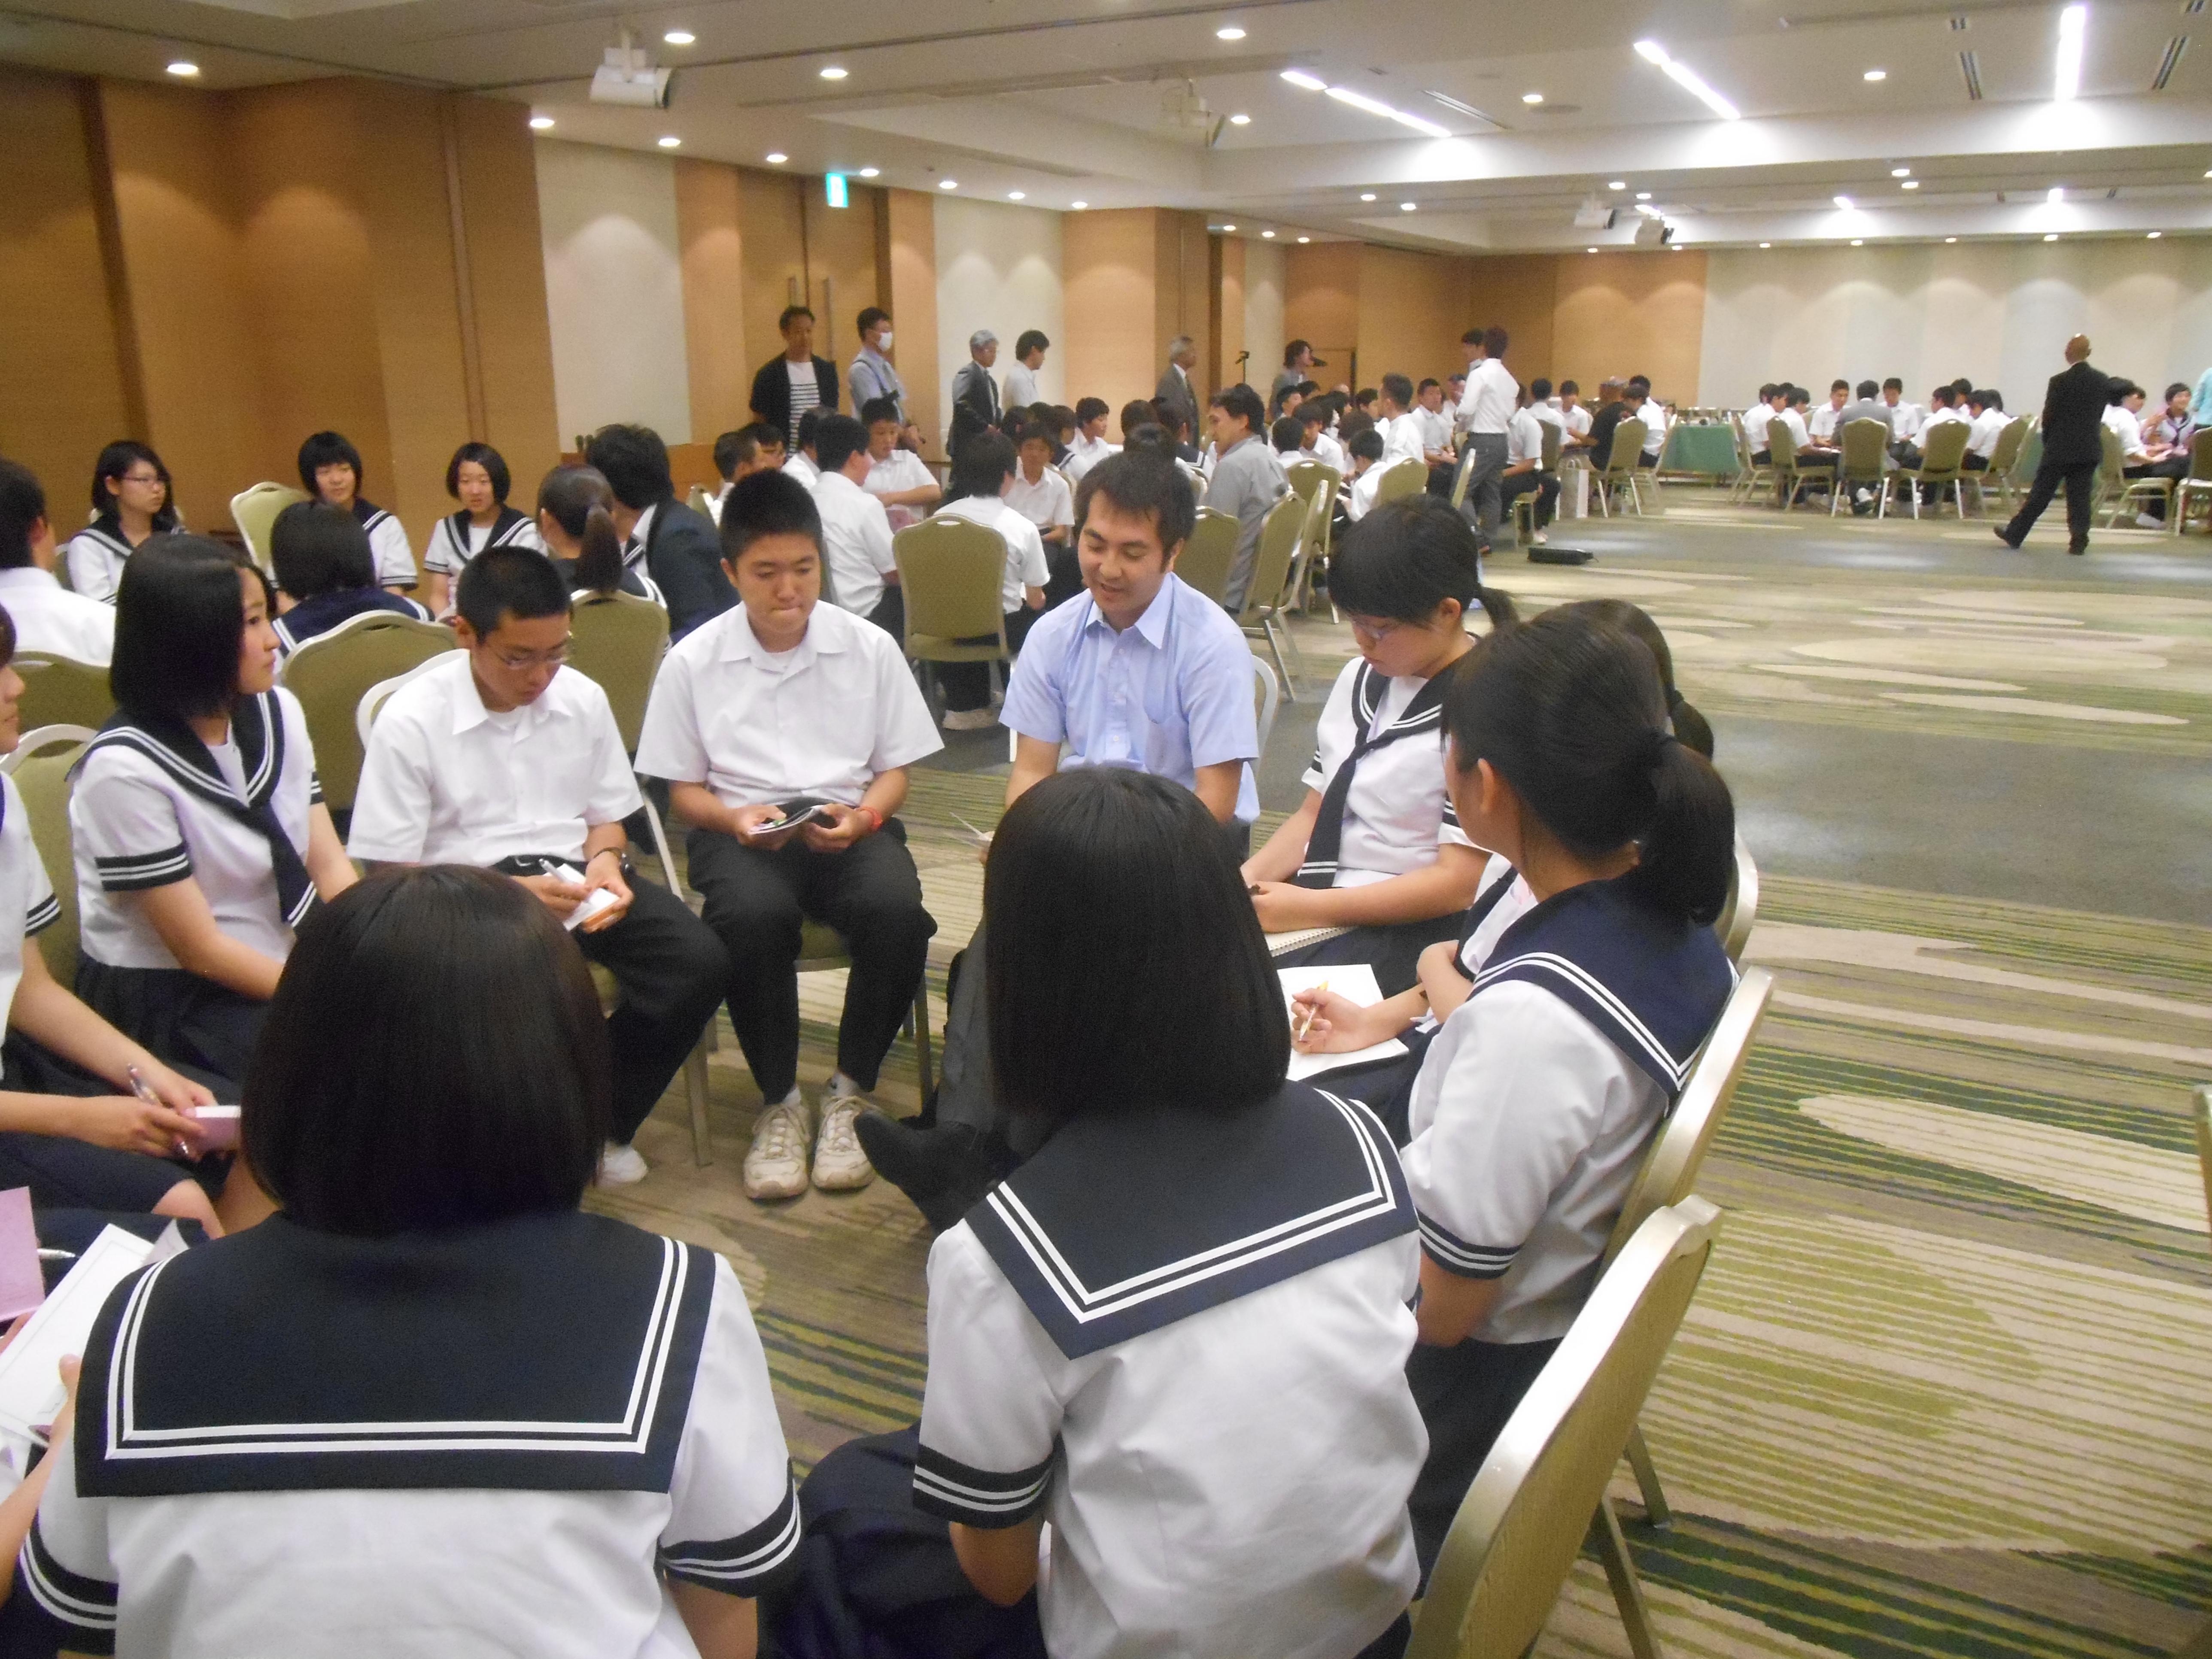 DSCN4403 - AOsuki主催:青森市内の中学校(修学旅行)に夢を与える時間